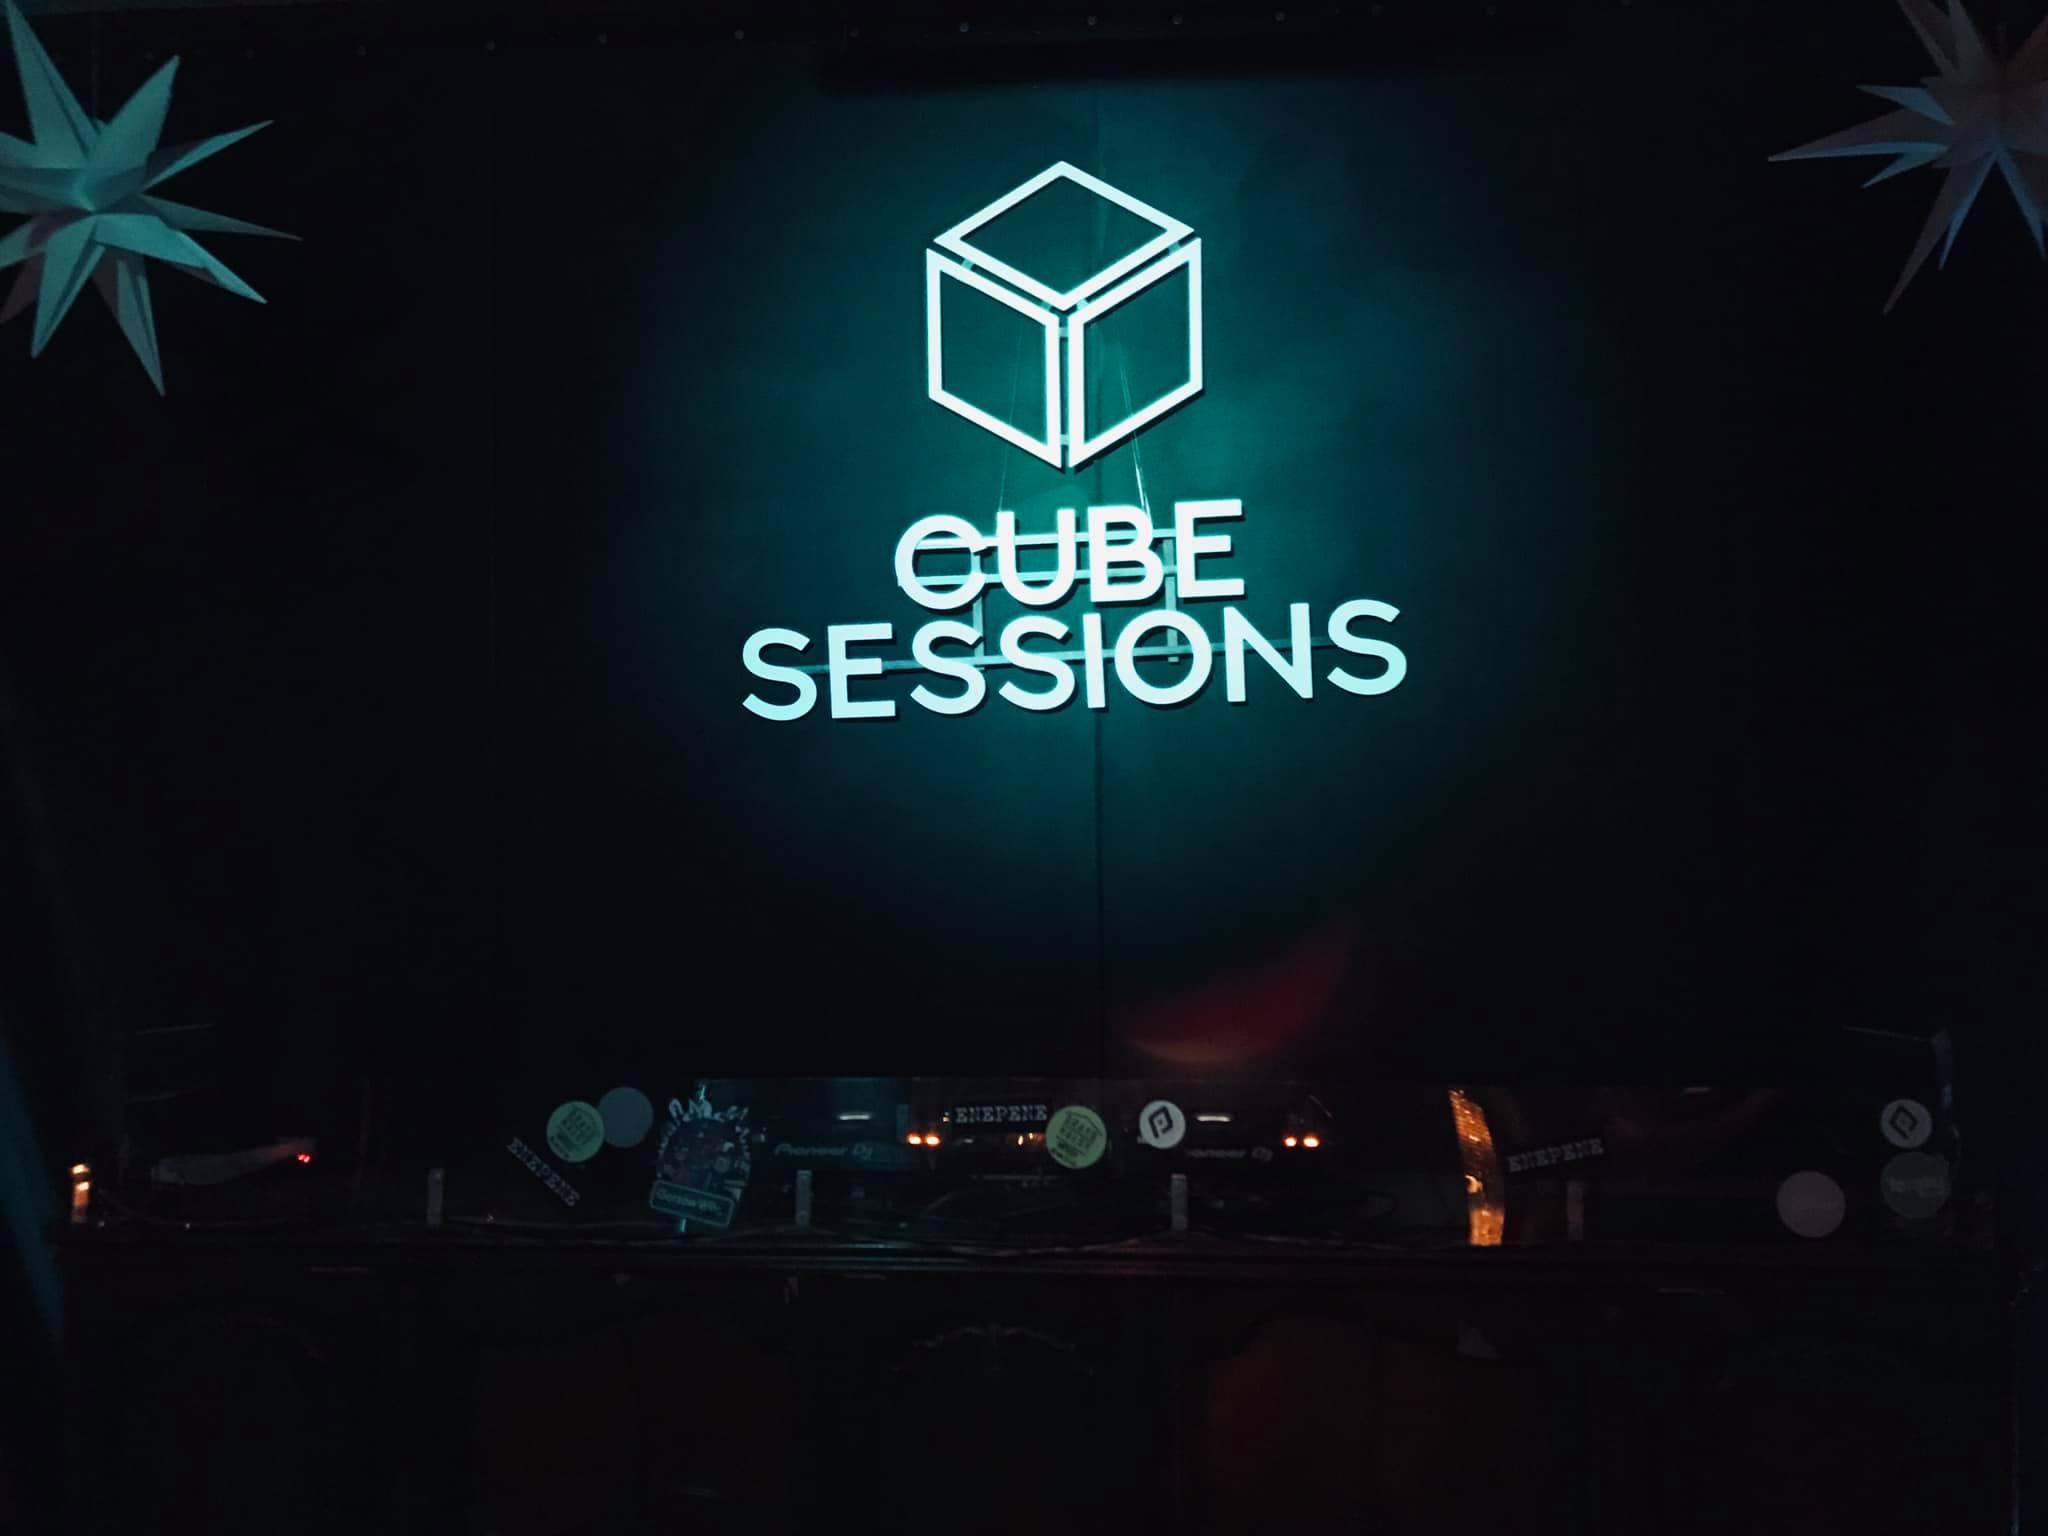 MixcoolTURA Cube Sessions